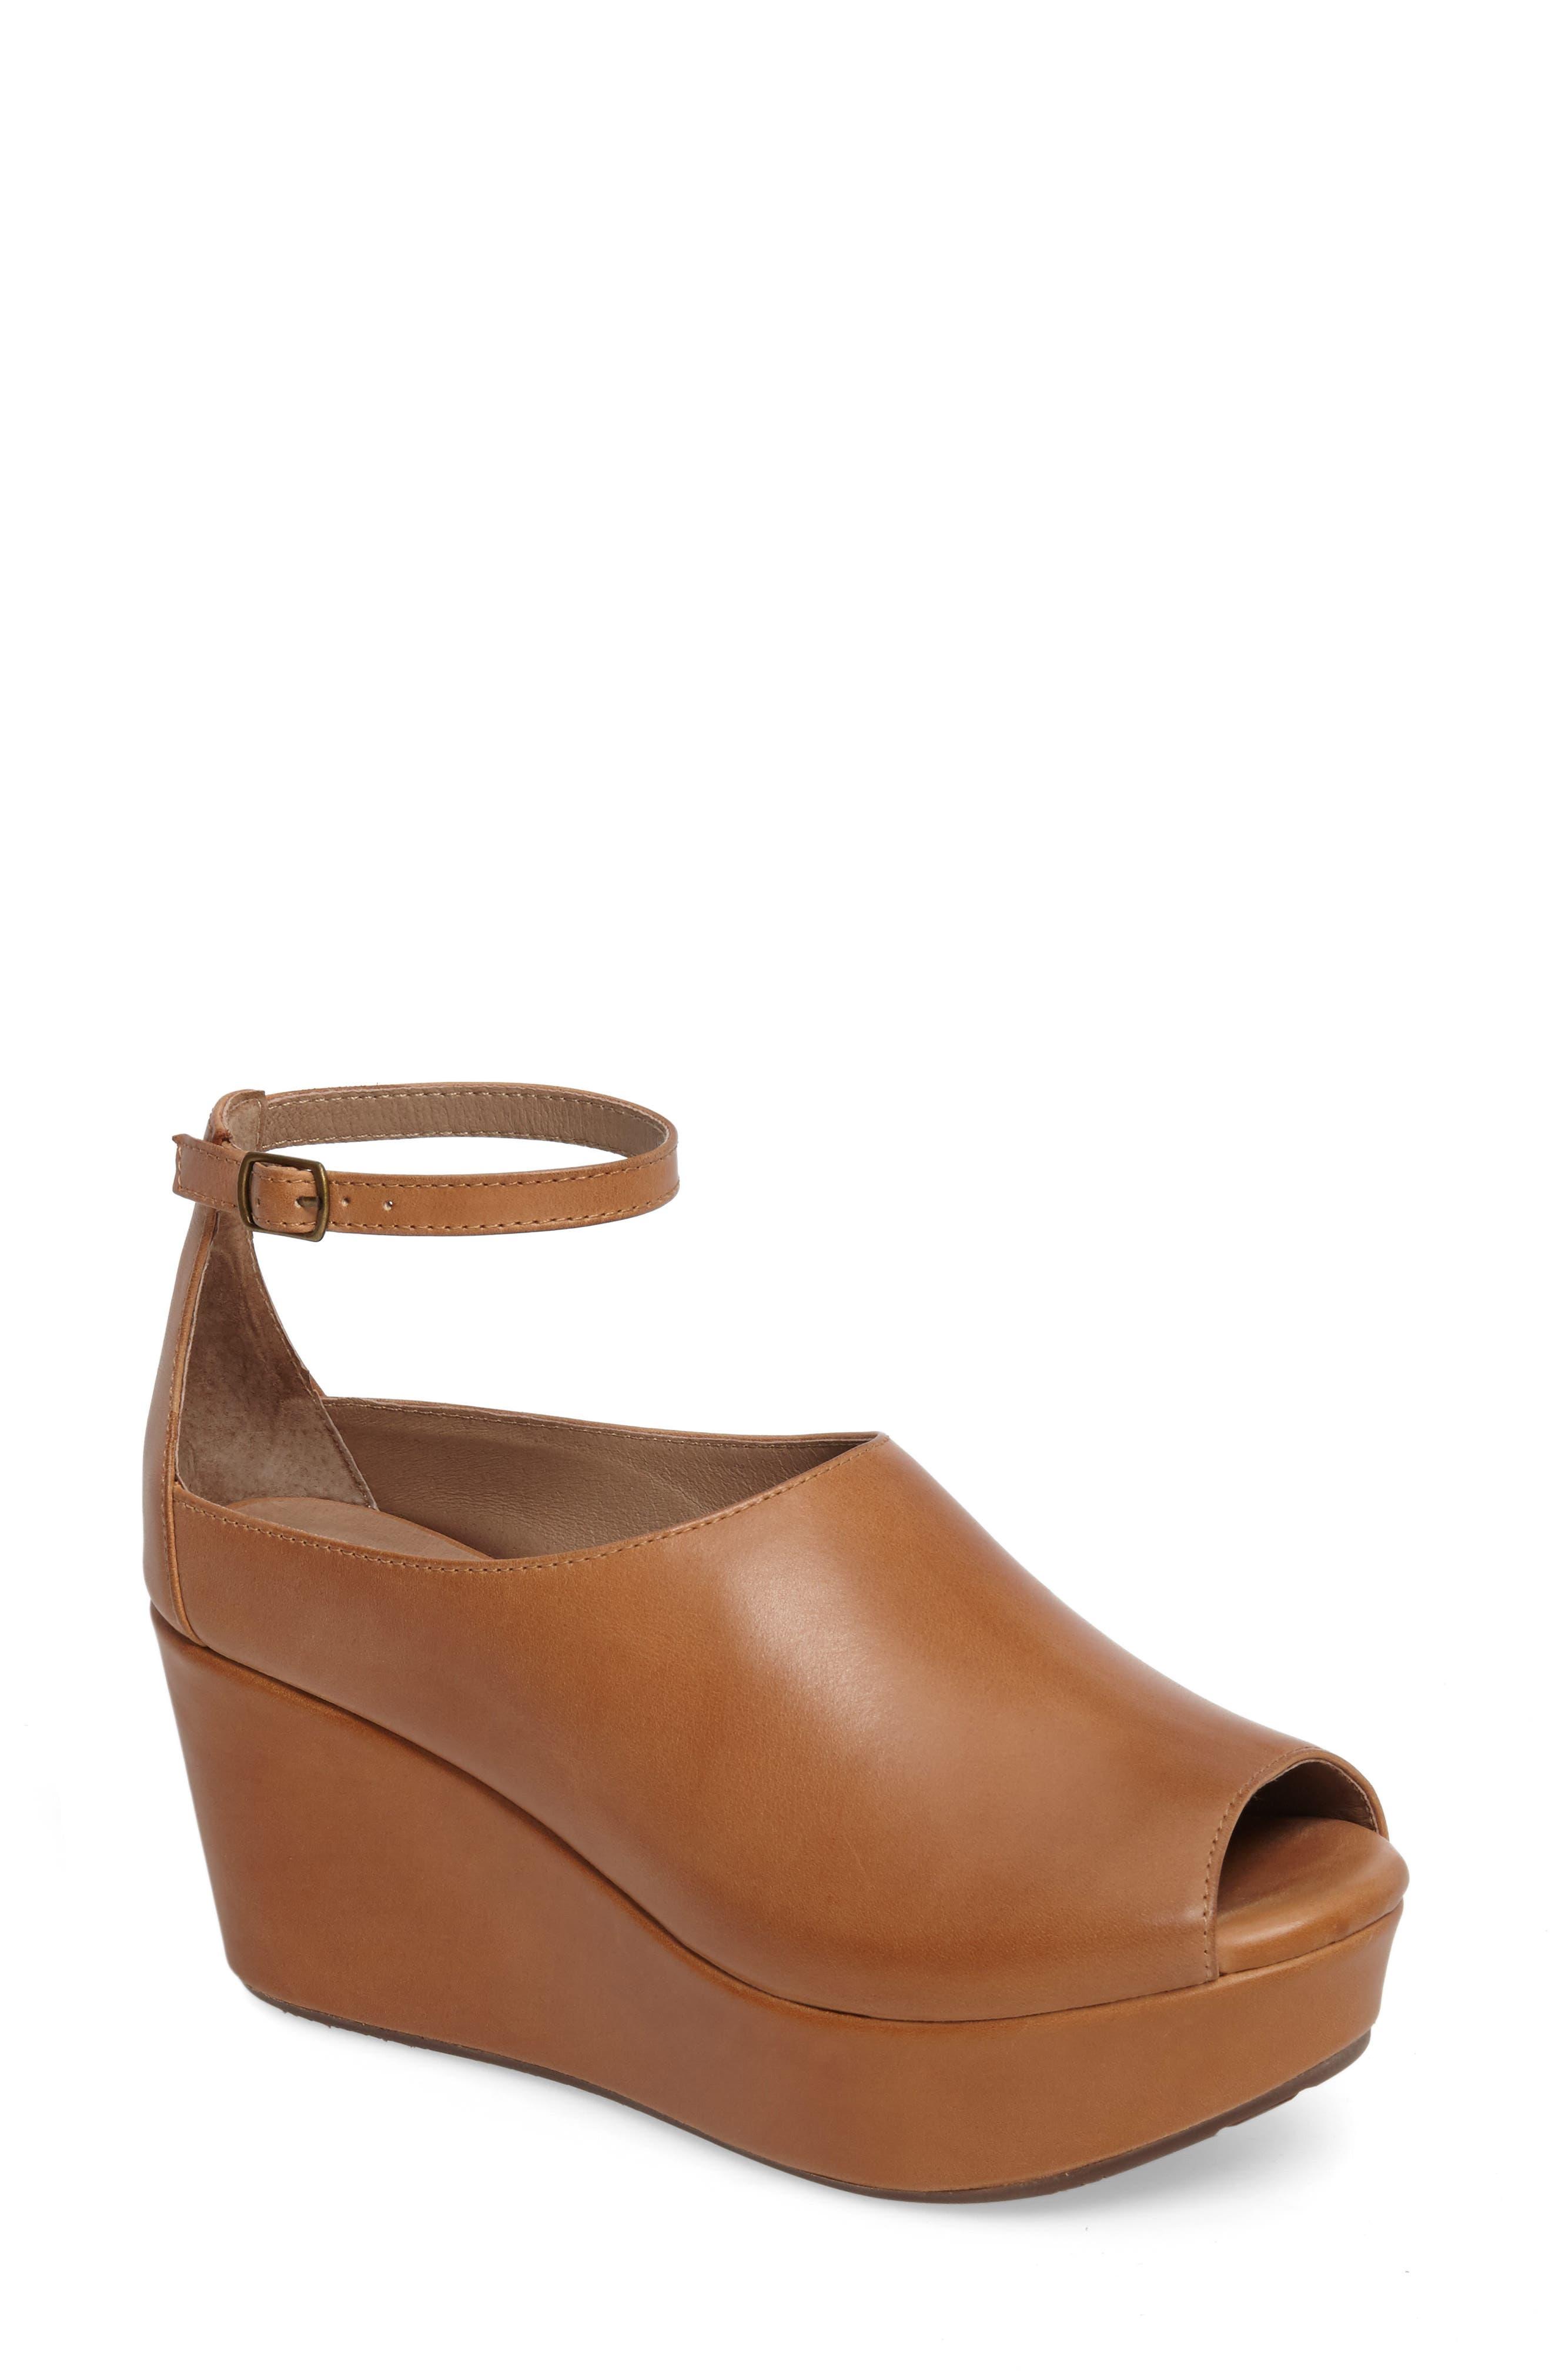 Chocolat Blu Walter Ankle Strap Wedge Sandal- Brown